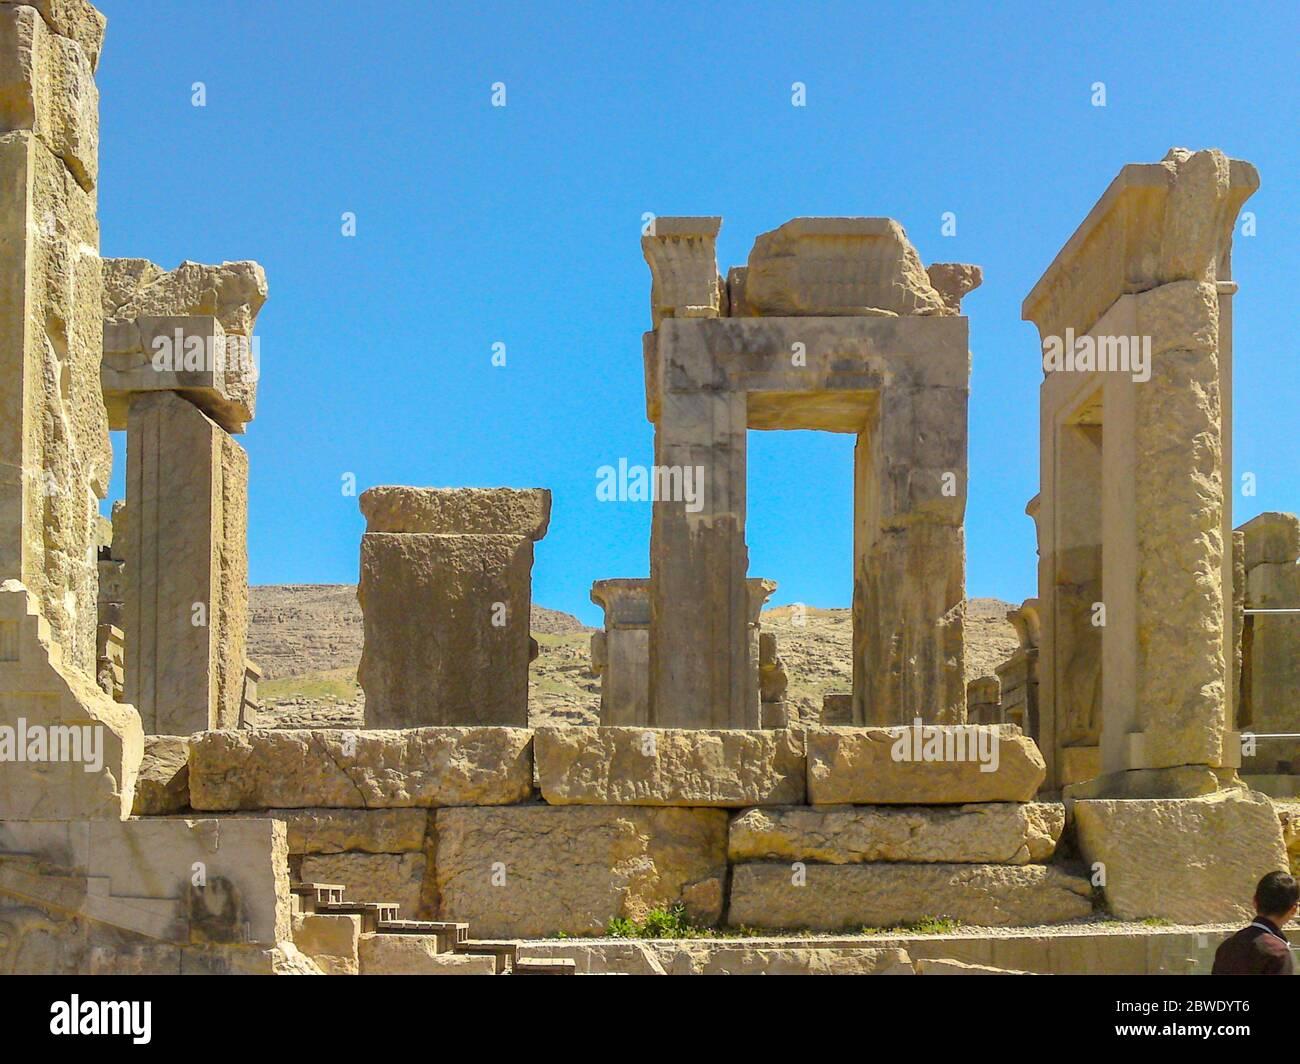 Shiraz Persepolis Iran Ruins Of The Ceremonial Capital Of The Persian Empire Achaemenid Empire Ancient City Persepolis One Of Unesco World Heri Stock Photo Alamy